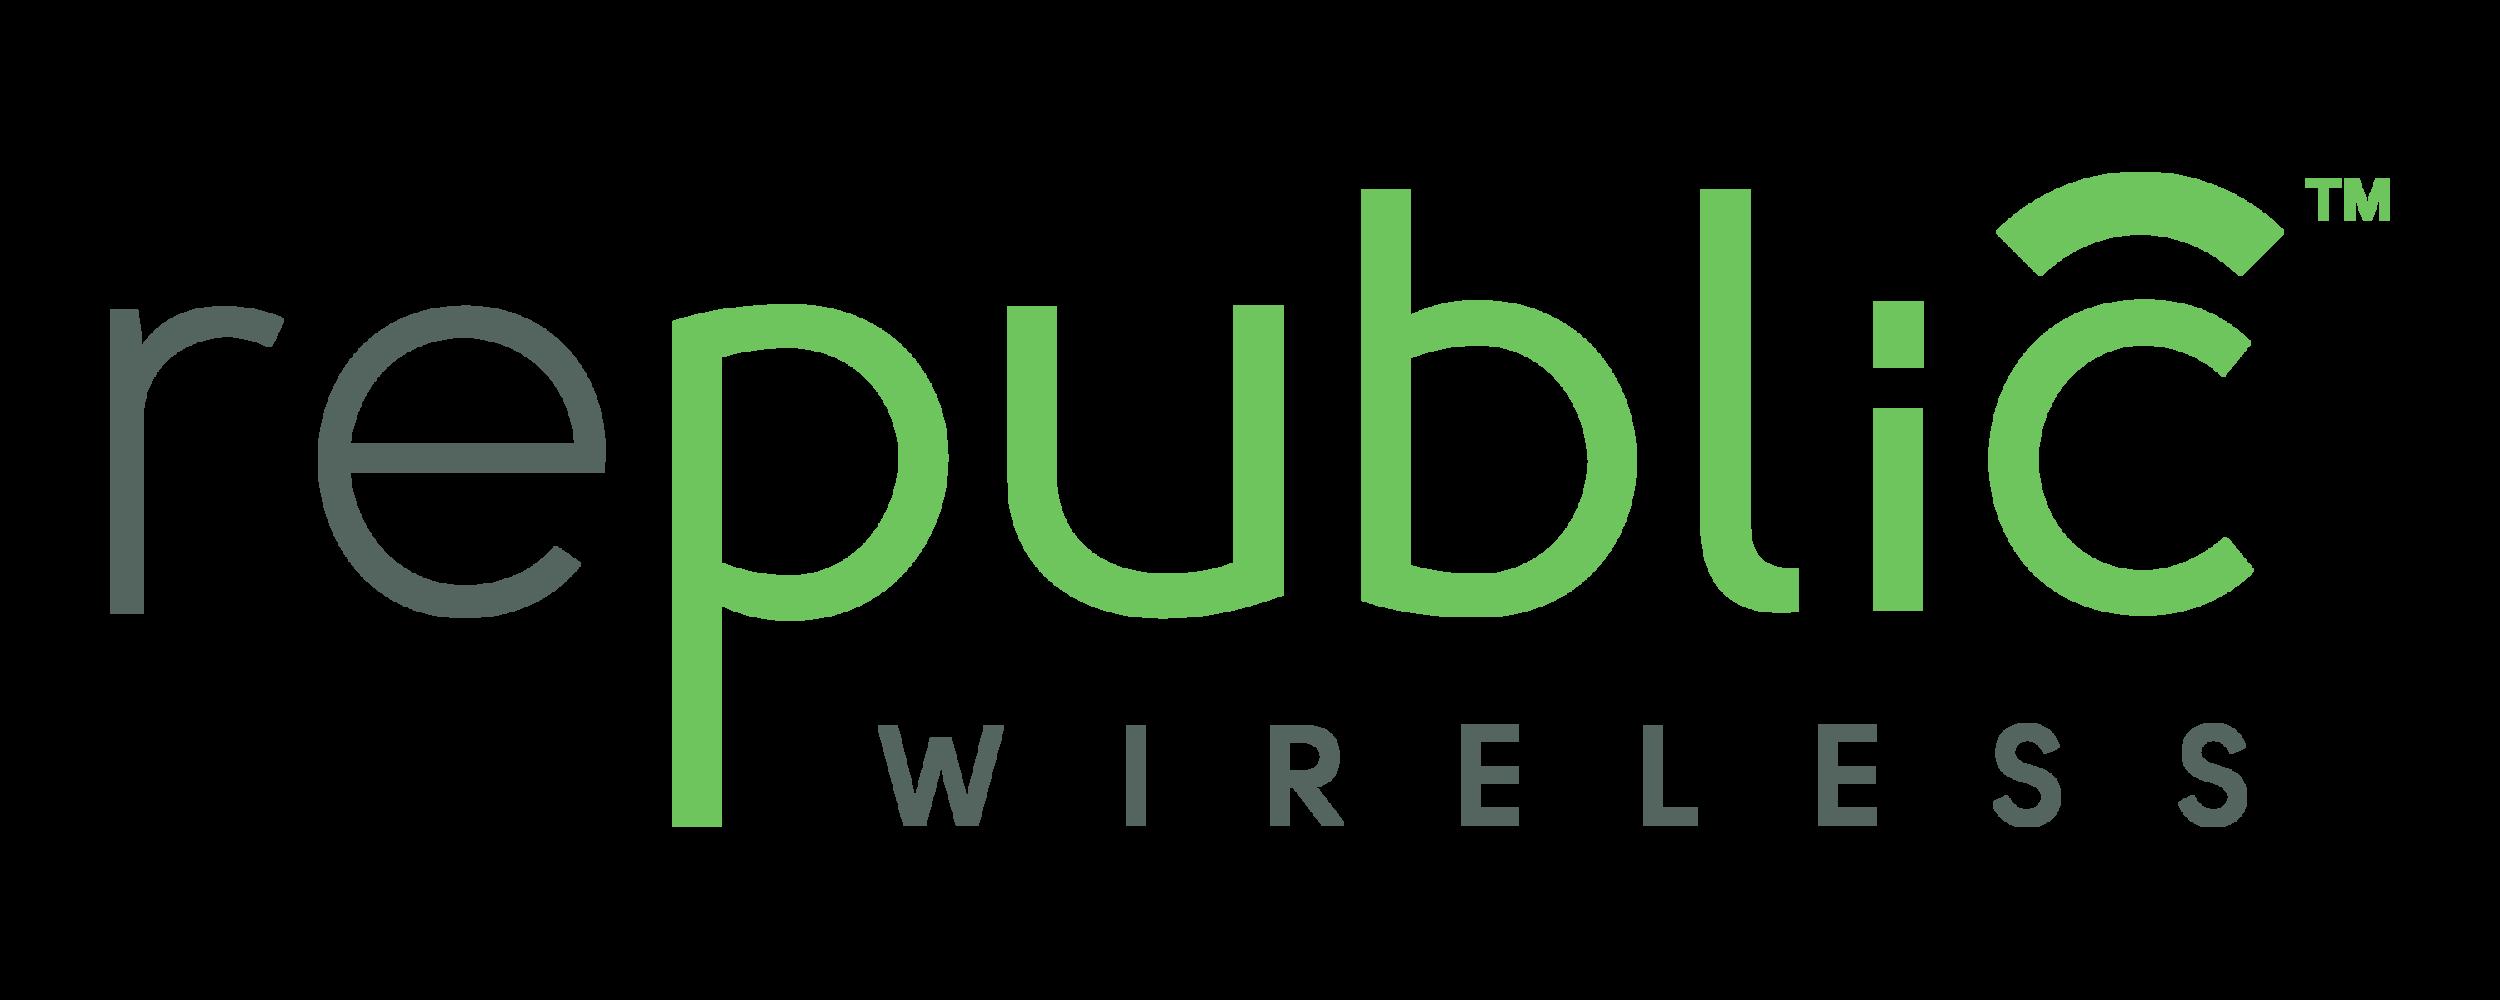 republic-wireless-logo.png